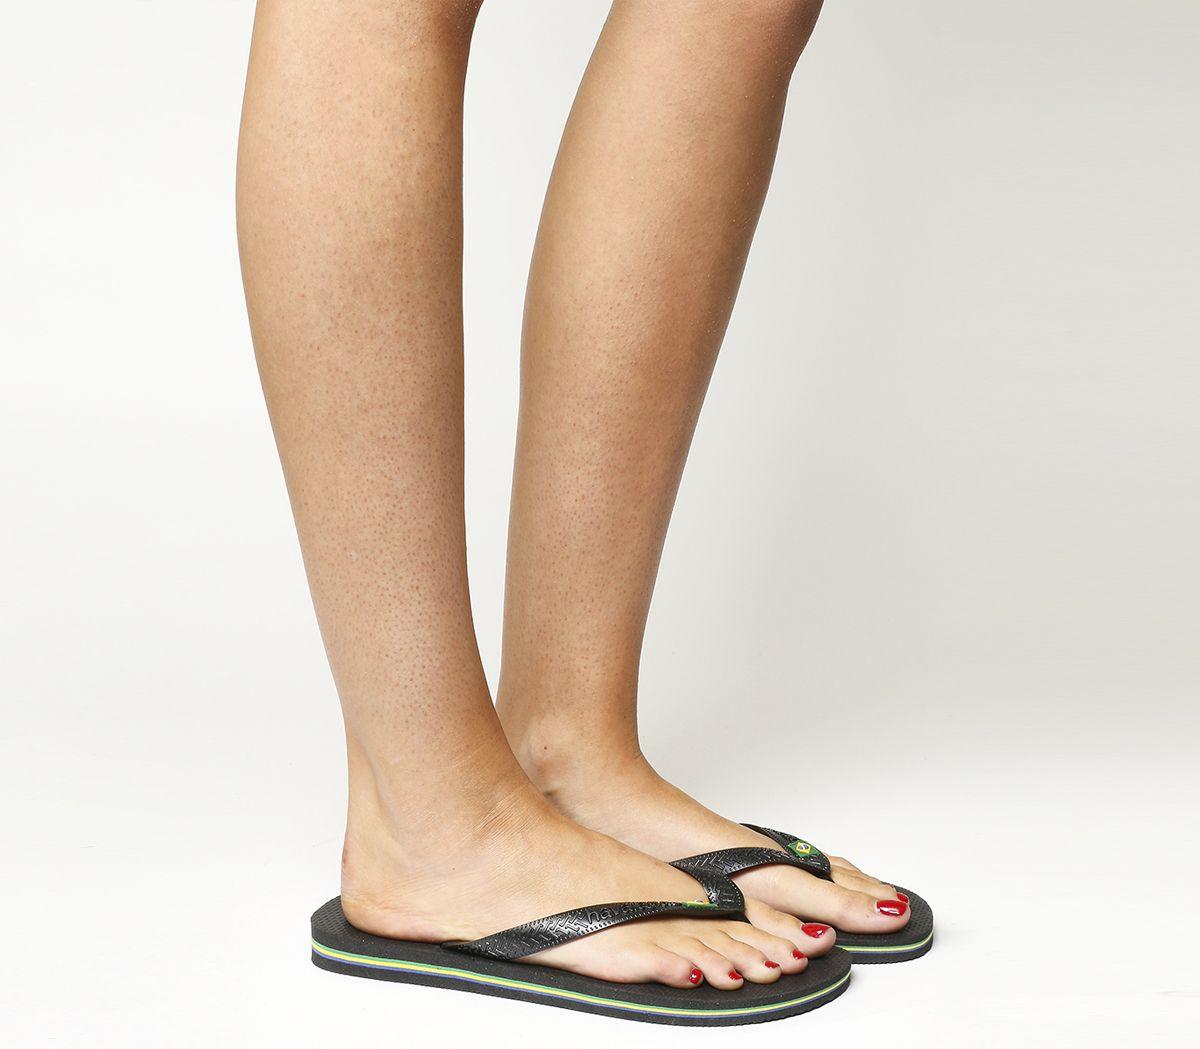 449da7171 Havaianas Brazil Flip-flop Black Rubber - Sandals